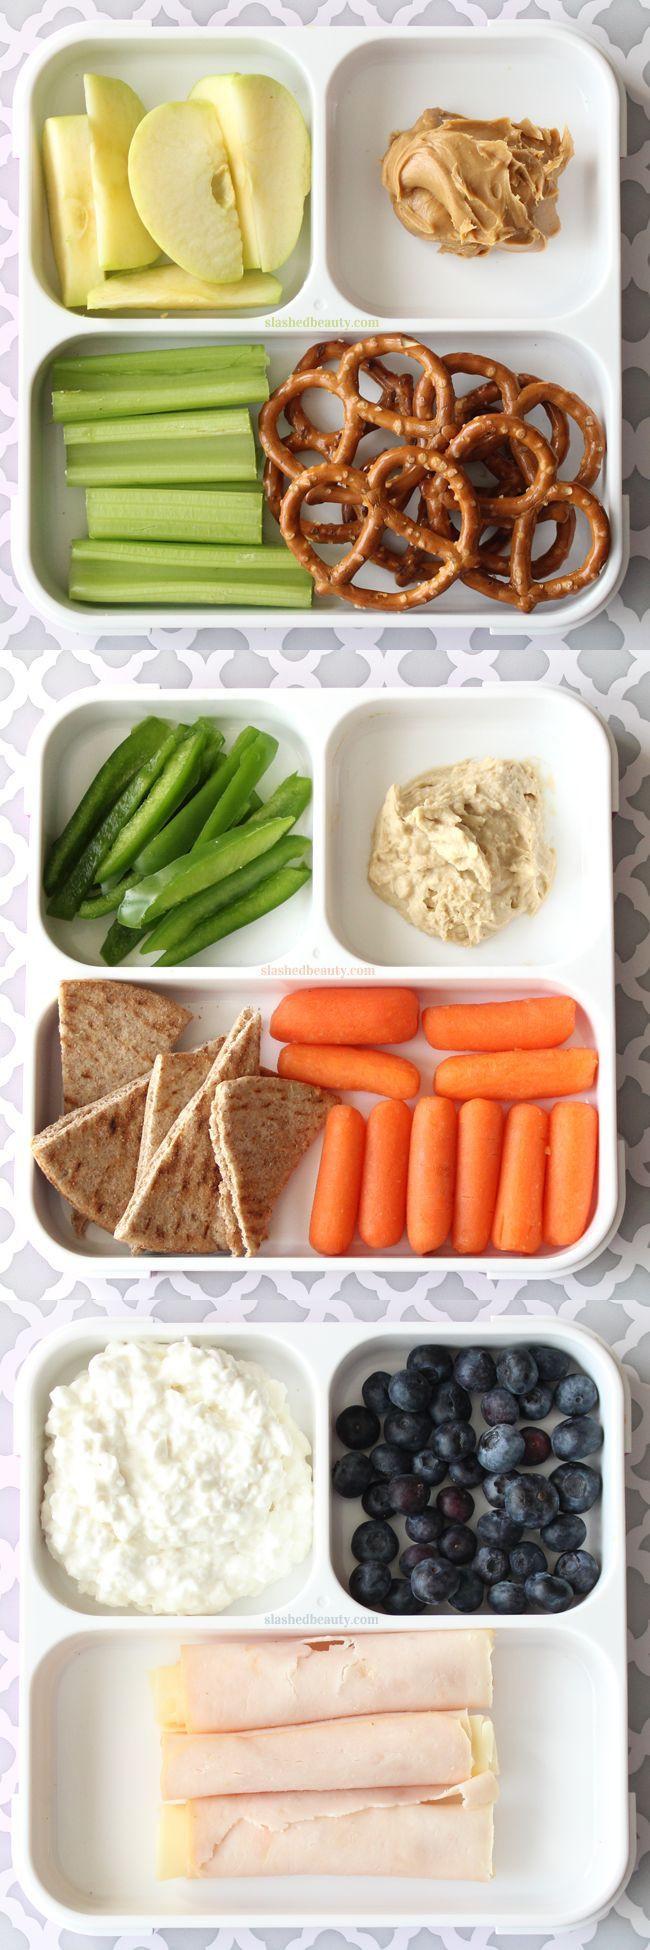 Quick Easy Healthy Snacks  Best 25 Healthy snacks ideas on Pinterest